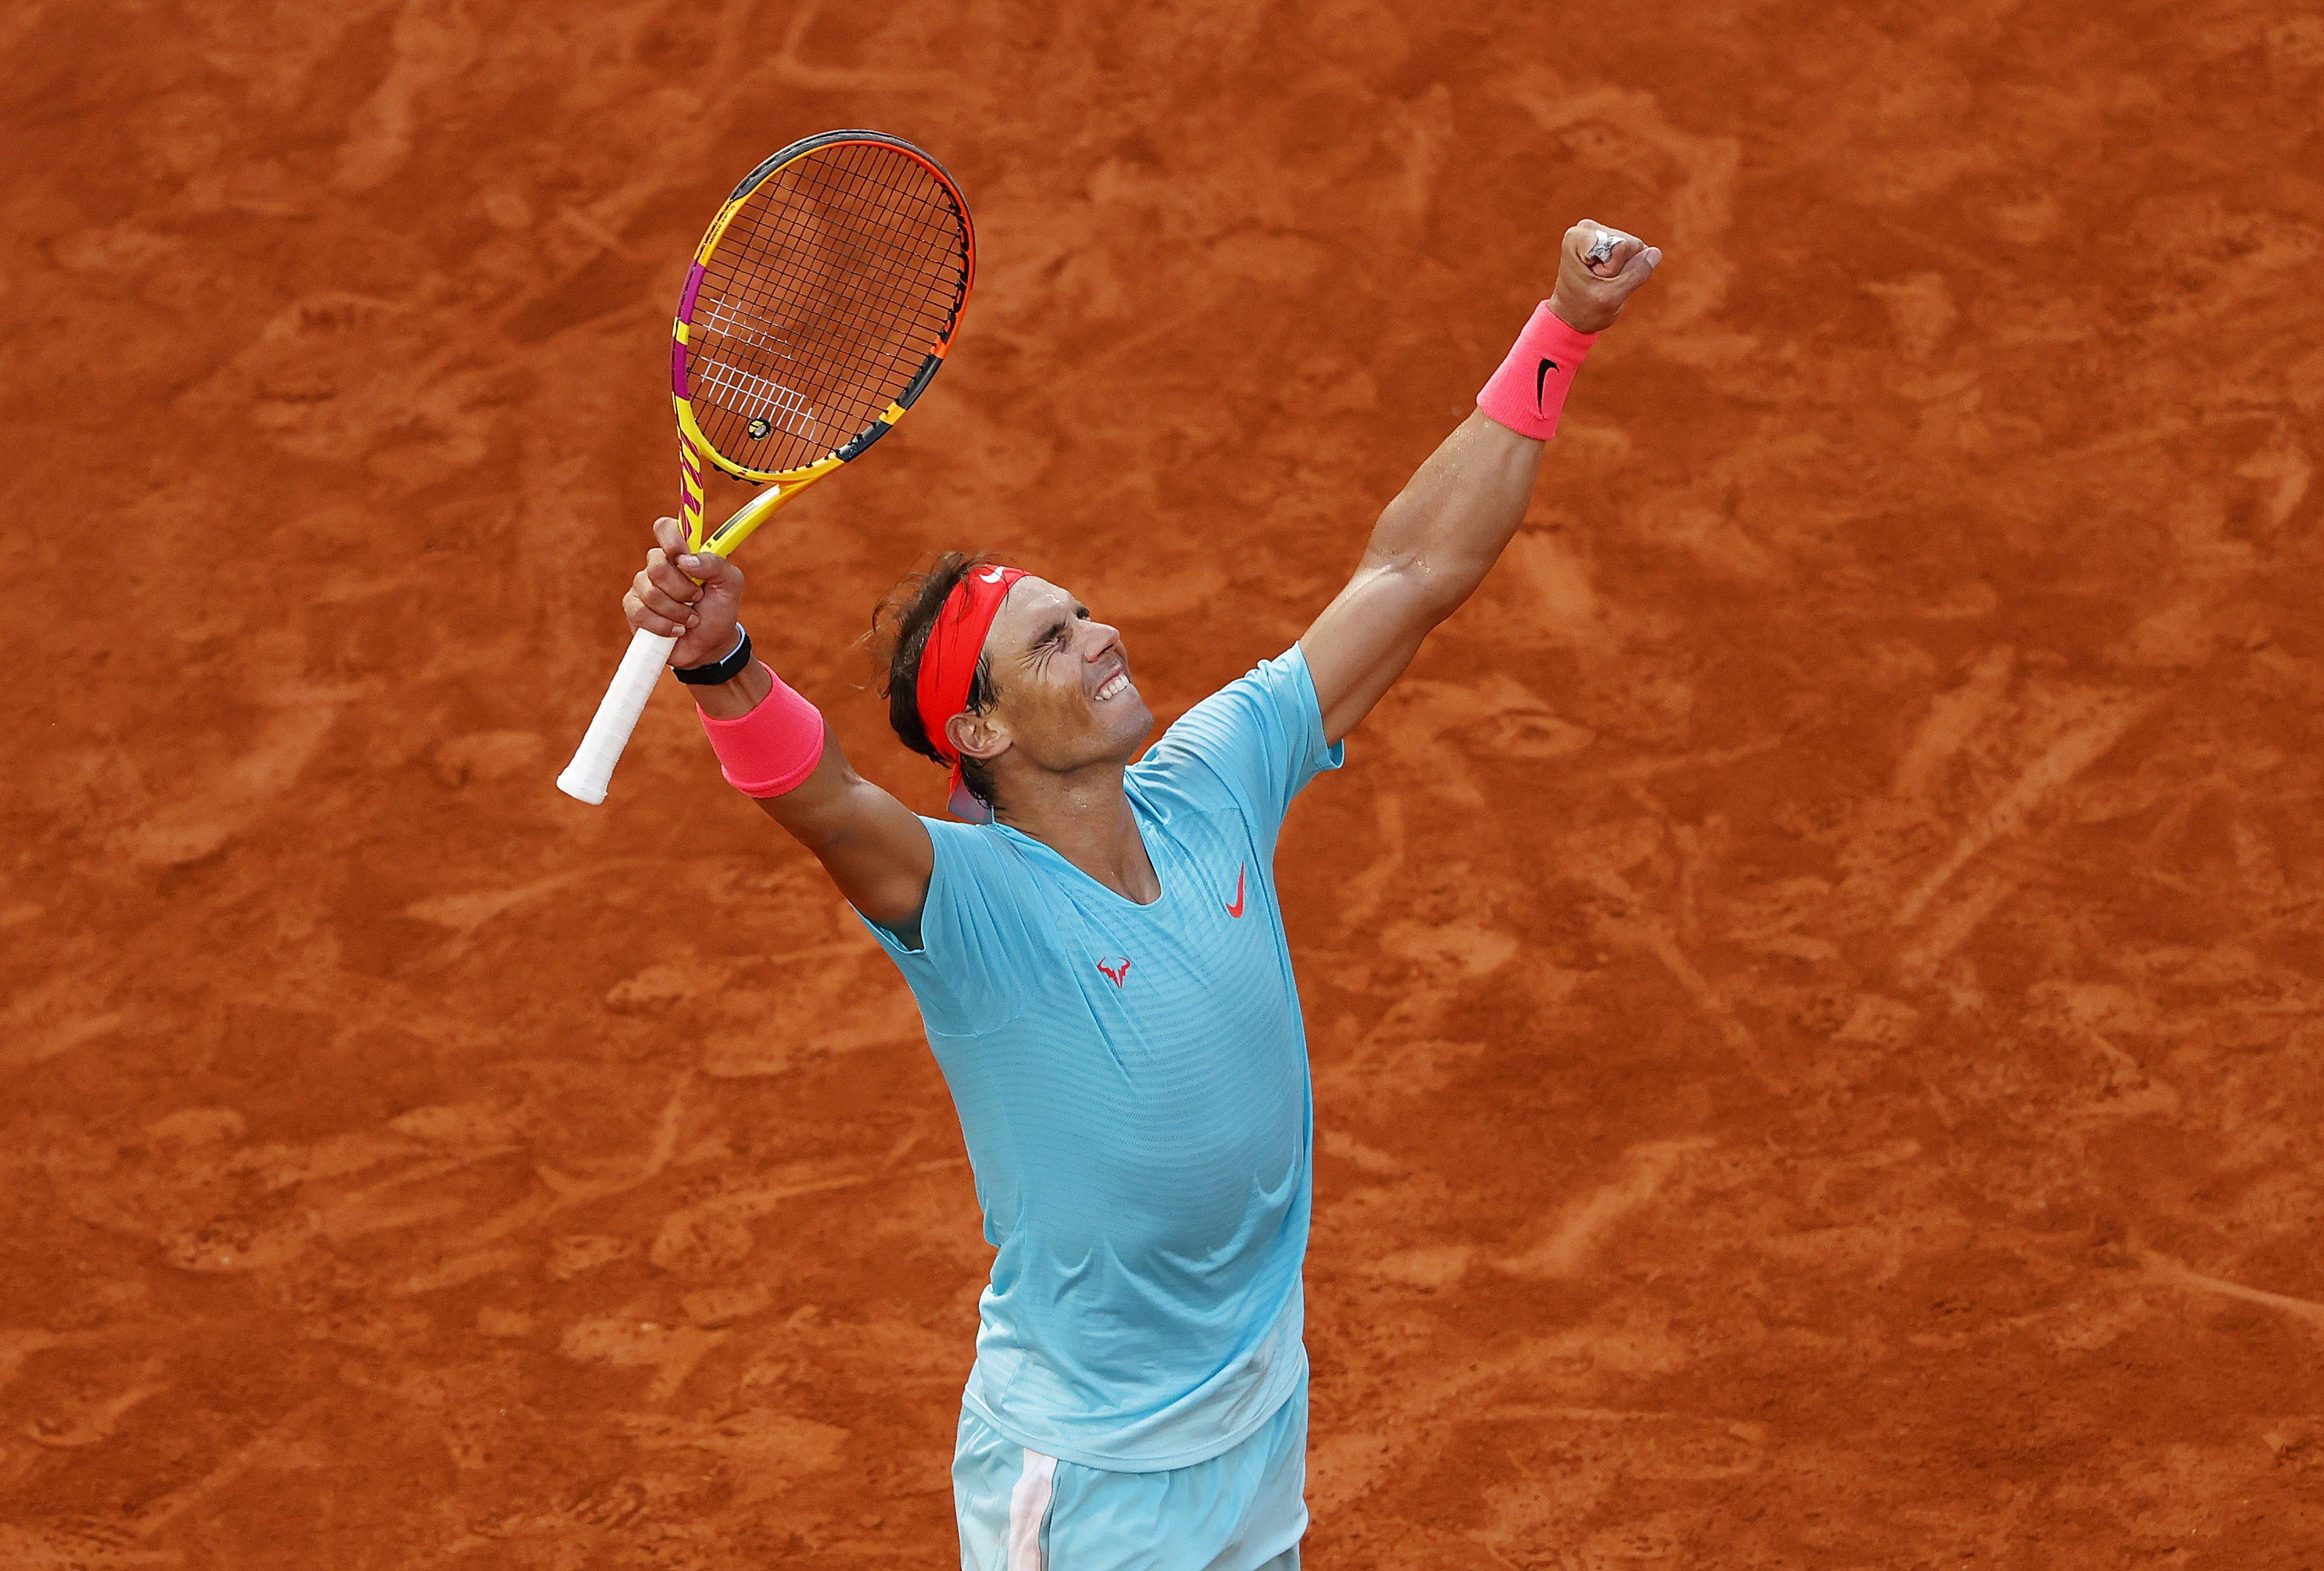 Garros